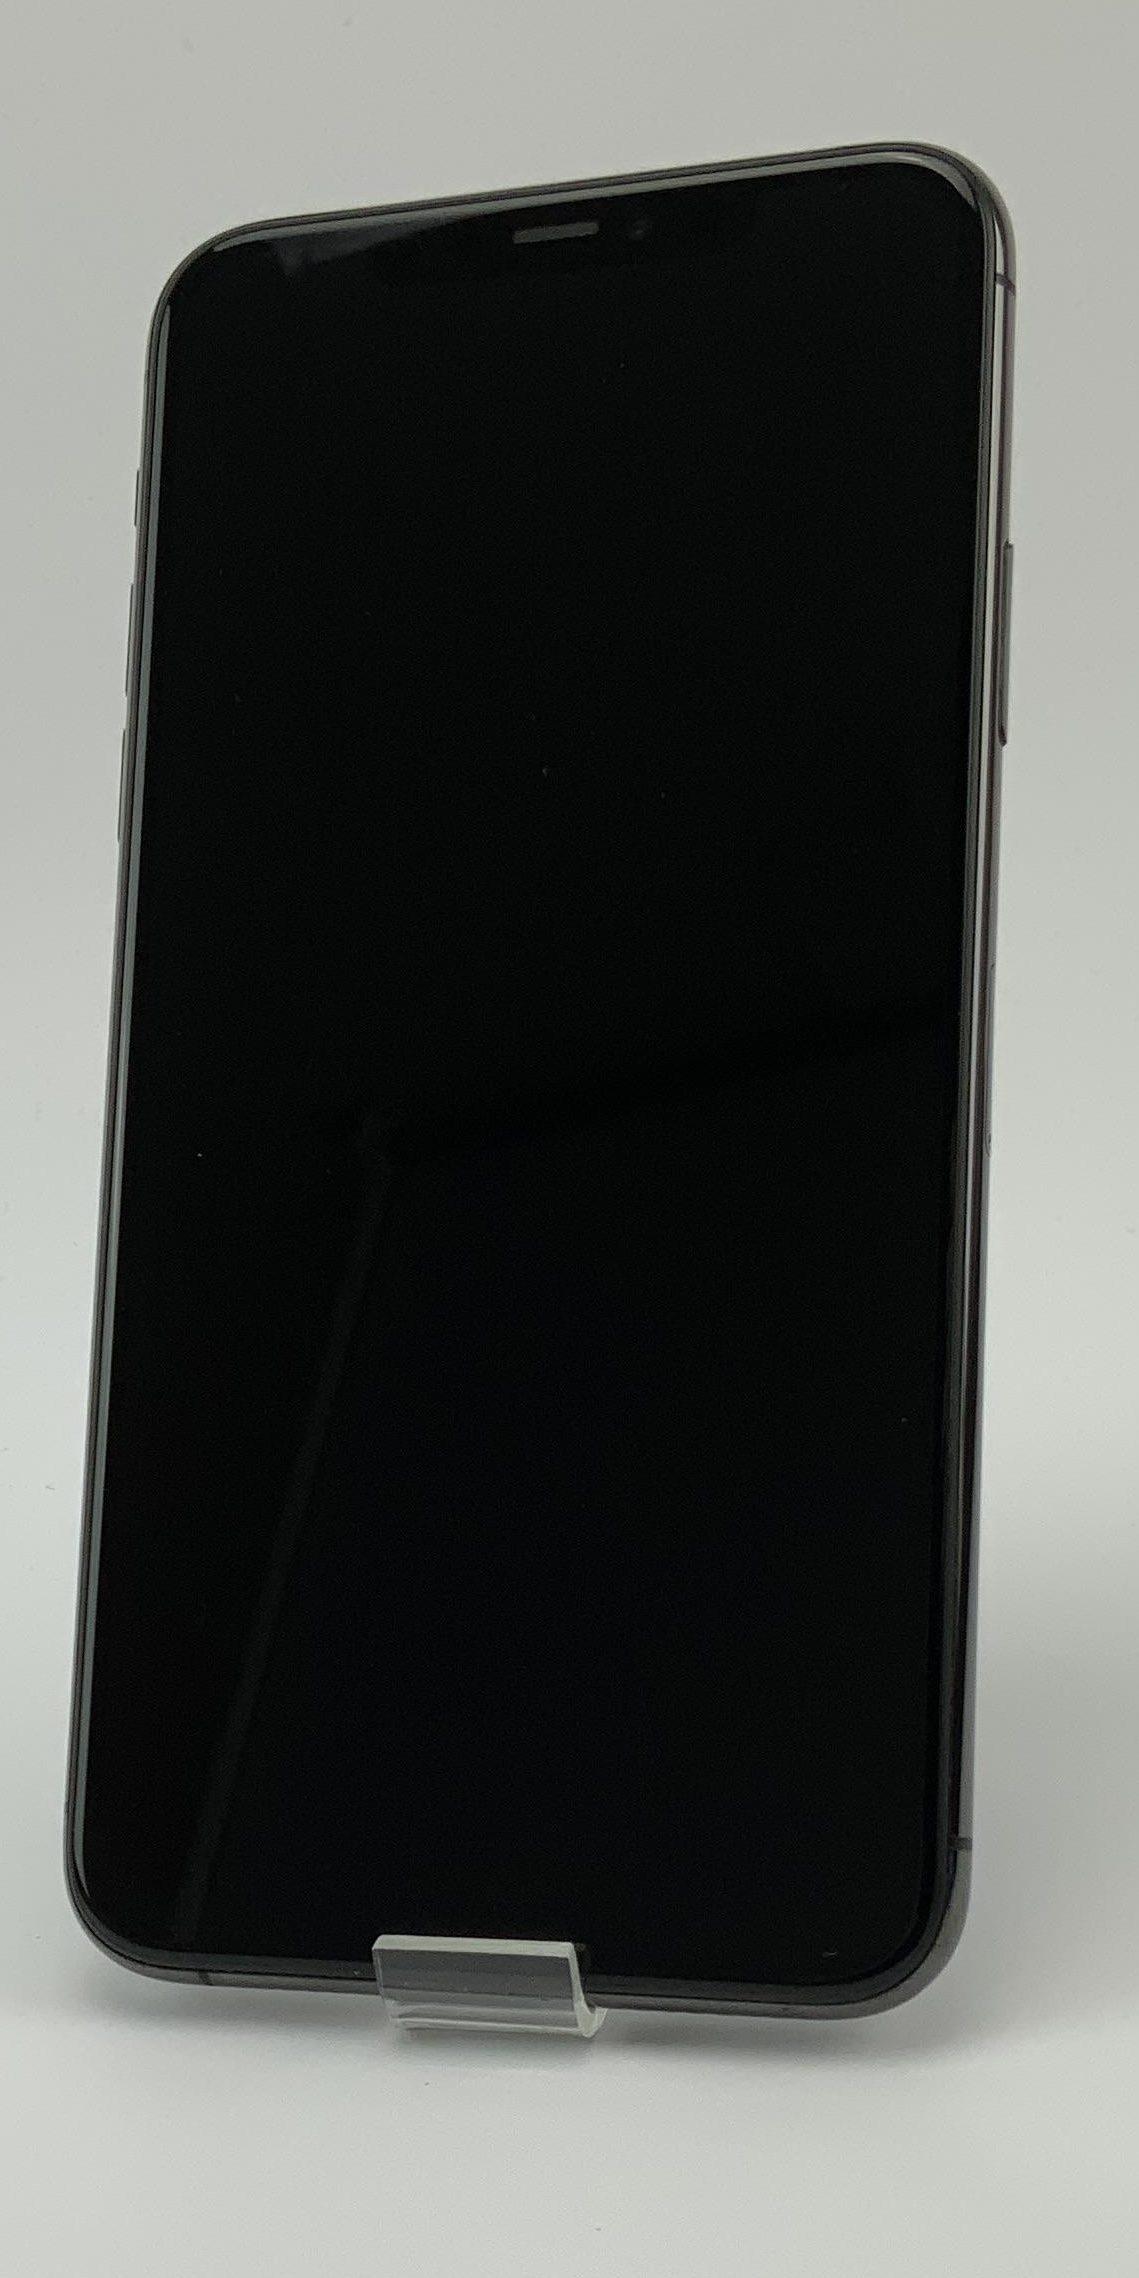 iPhone 11 Pro Max 64GB, 64GB, Space Gray, obraz 1